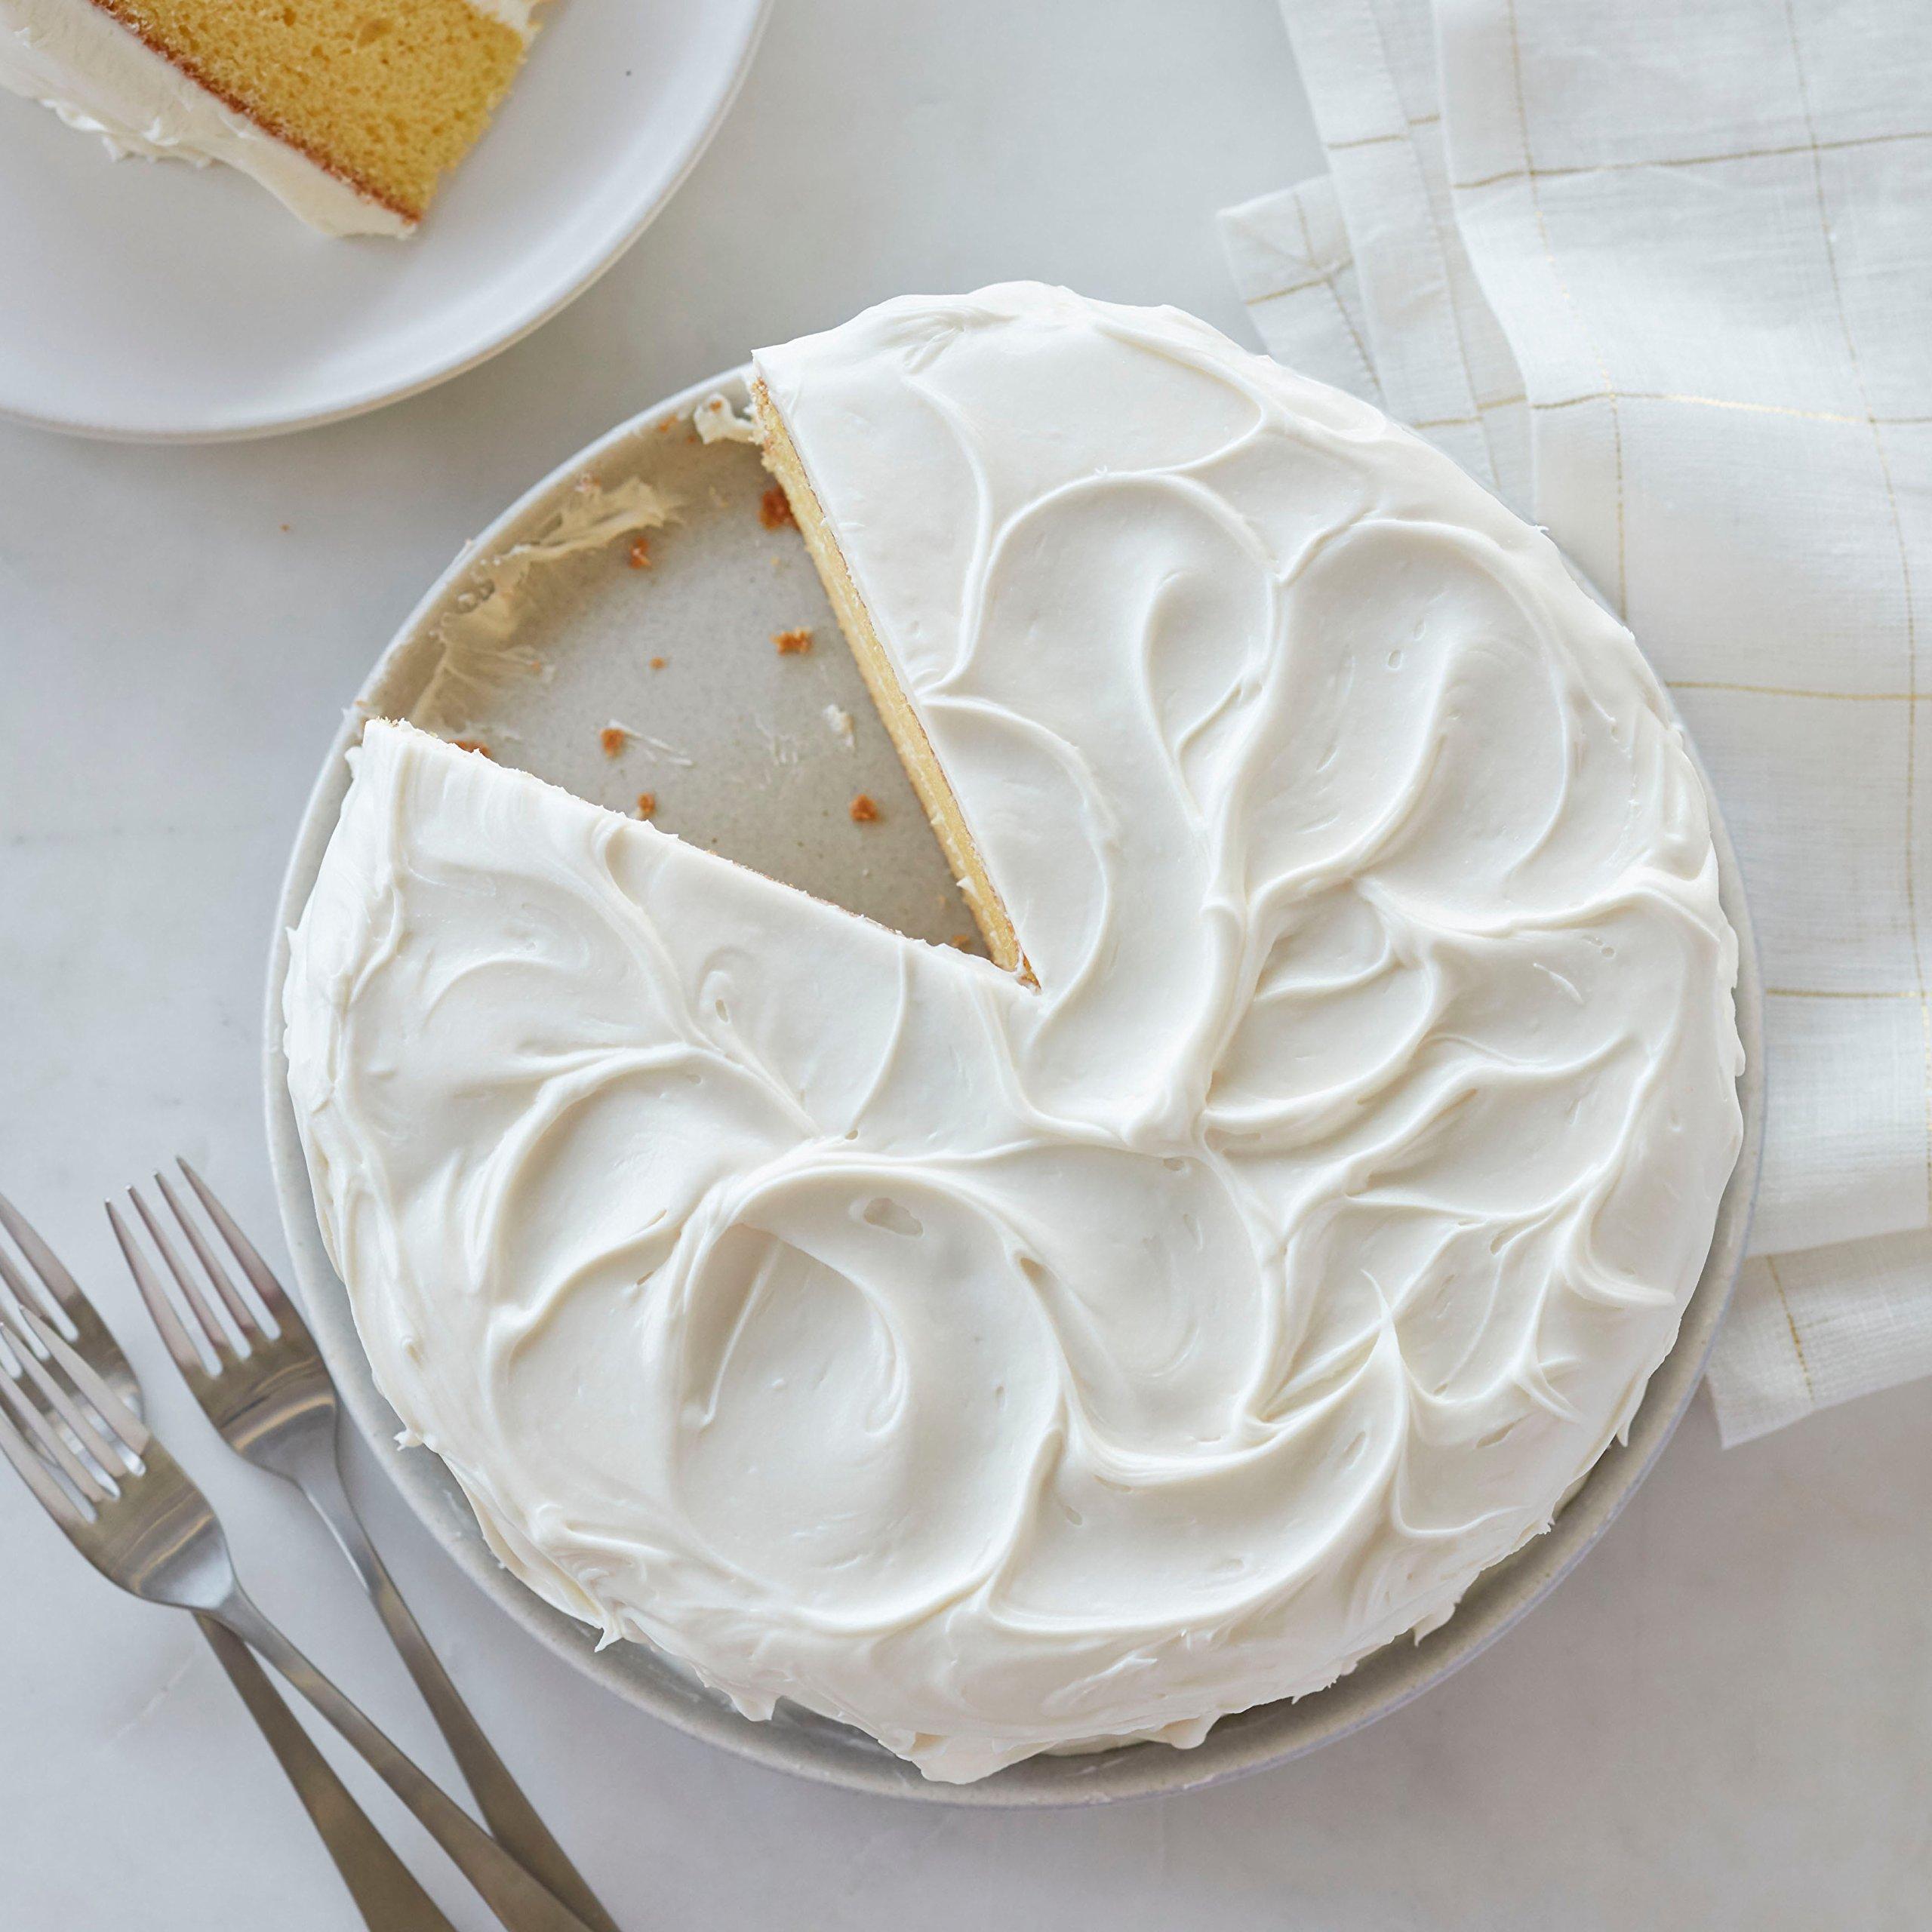 Wilton Creamy White Decorator Icing,Medium Consistency,4 lb. Tub, Cake Decorating Supplies by Wilton (Image #4)